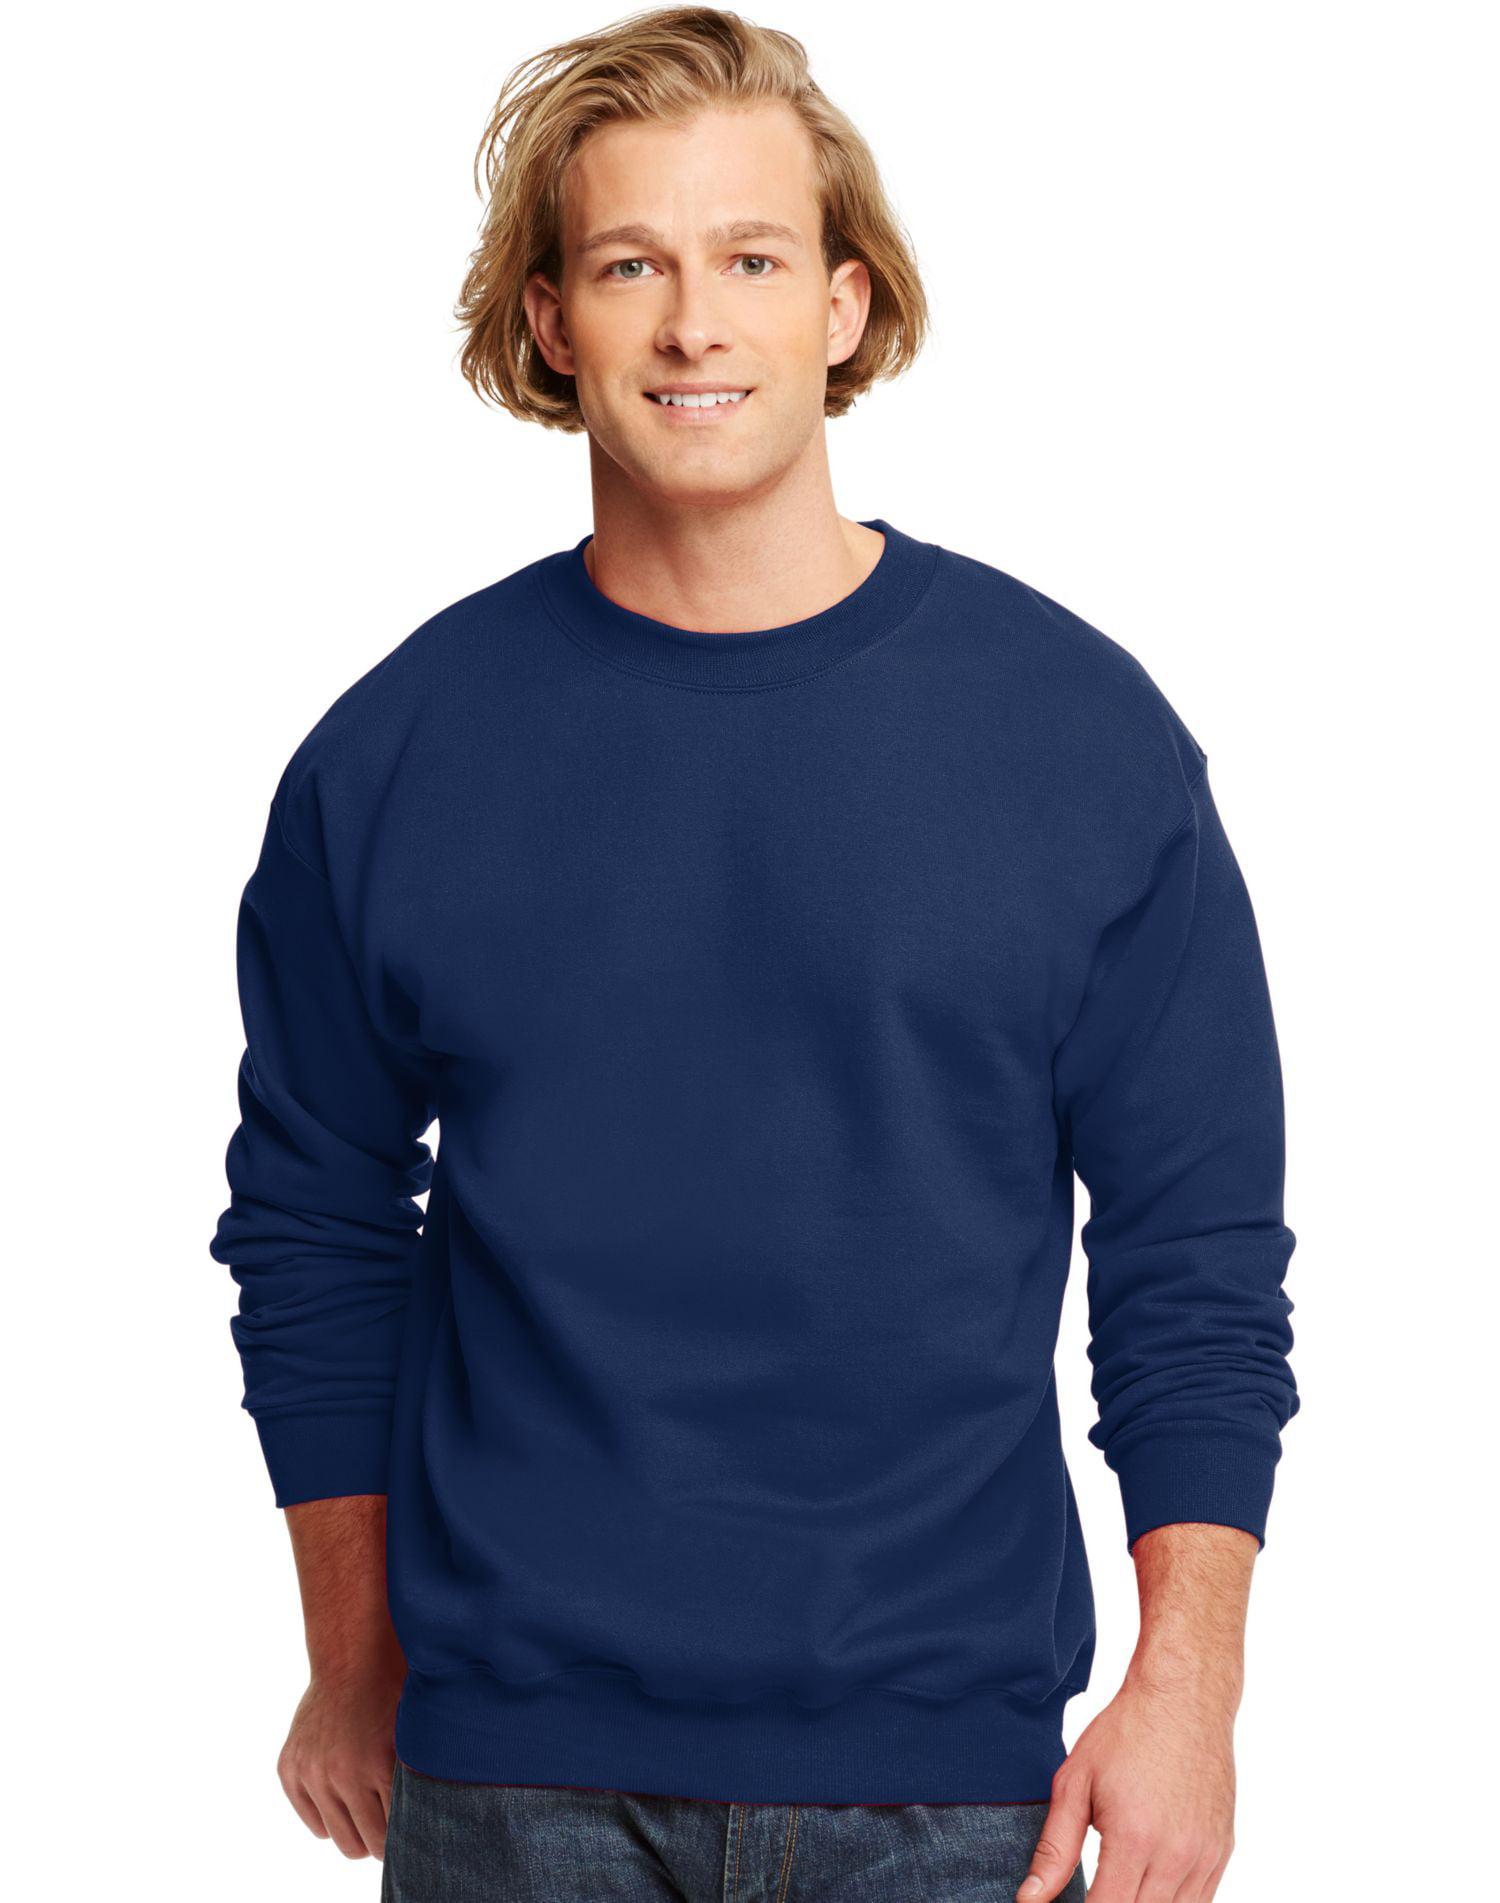 2709e2ecf21 Hanes Ultimate Cotton Adult Crewneck Sweatshirt